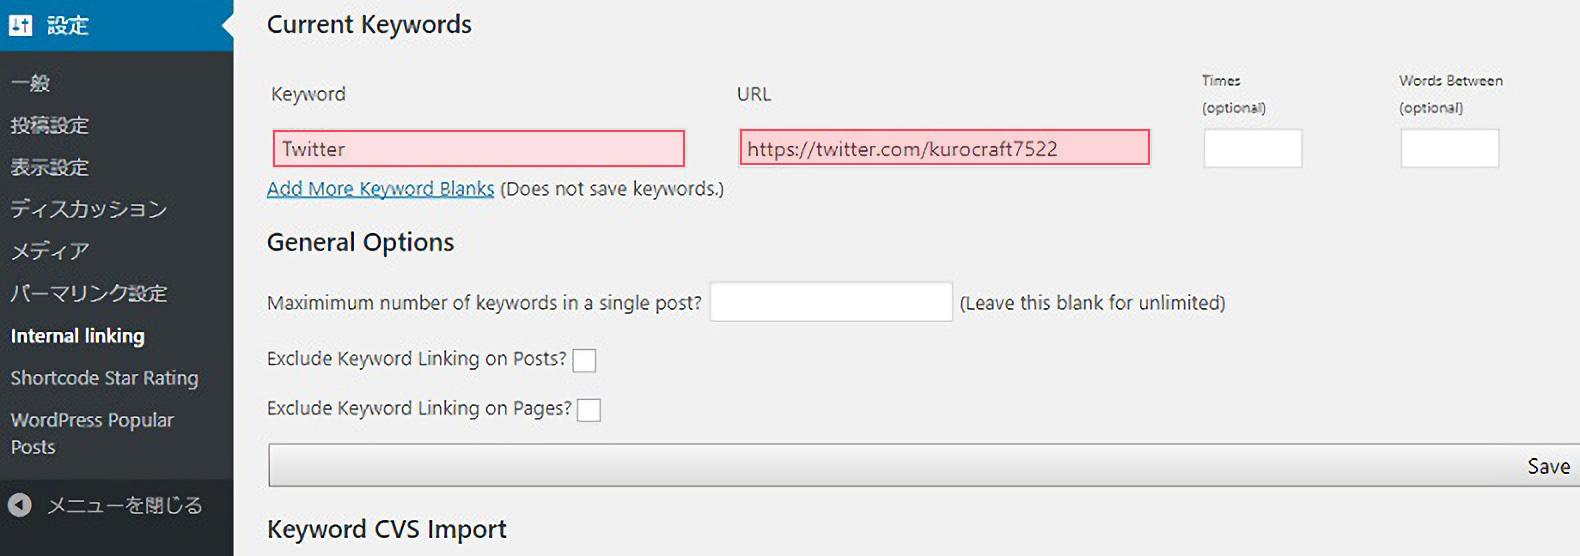 「Current Keywords」でキーワードのリンク設定